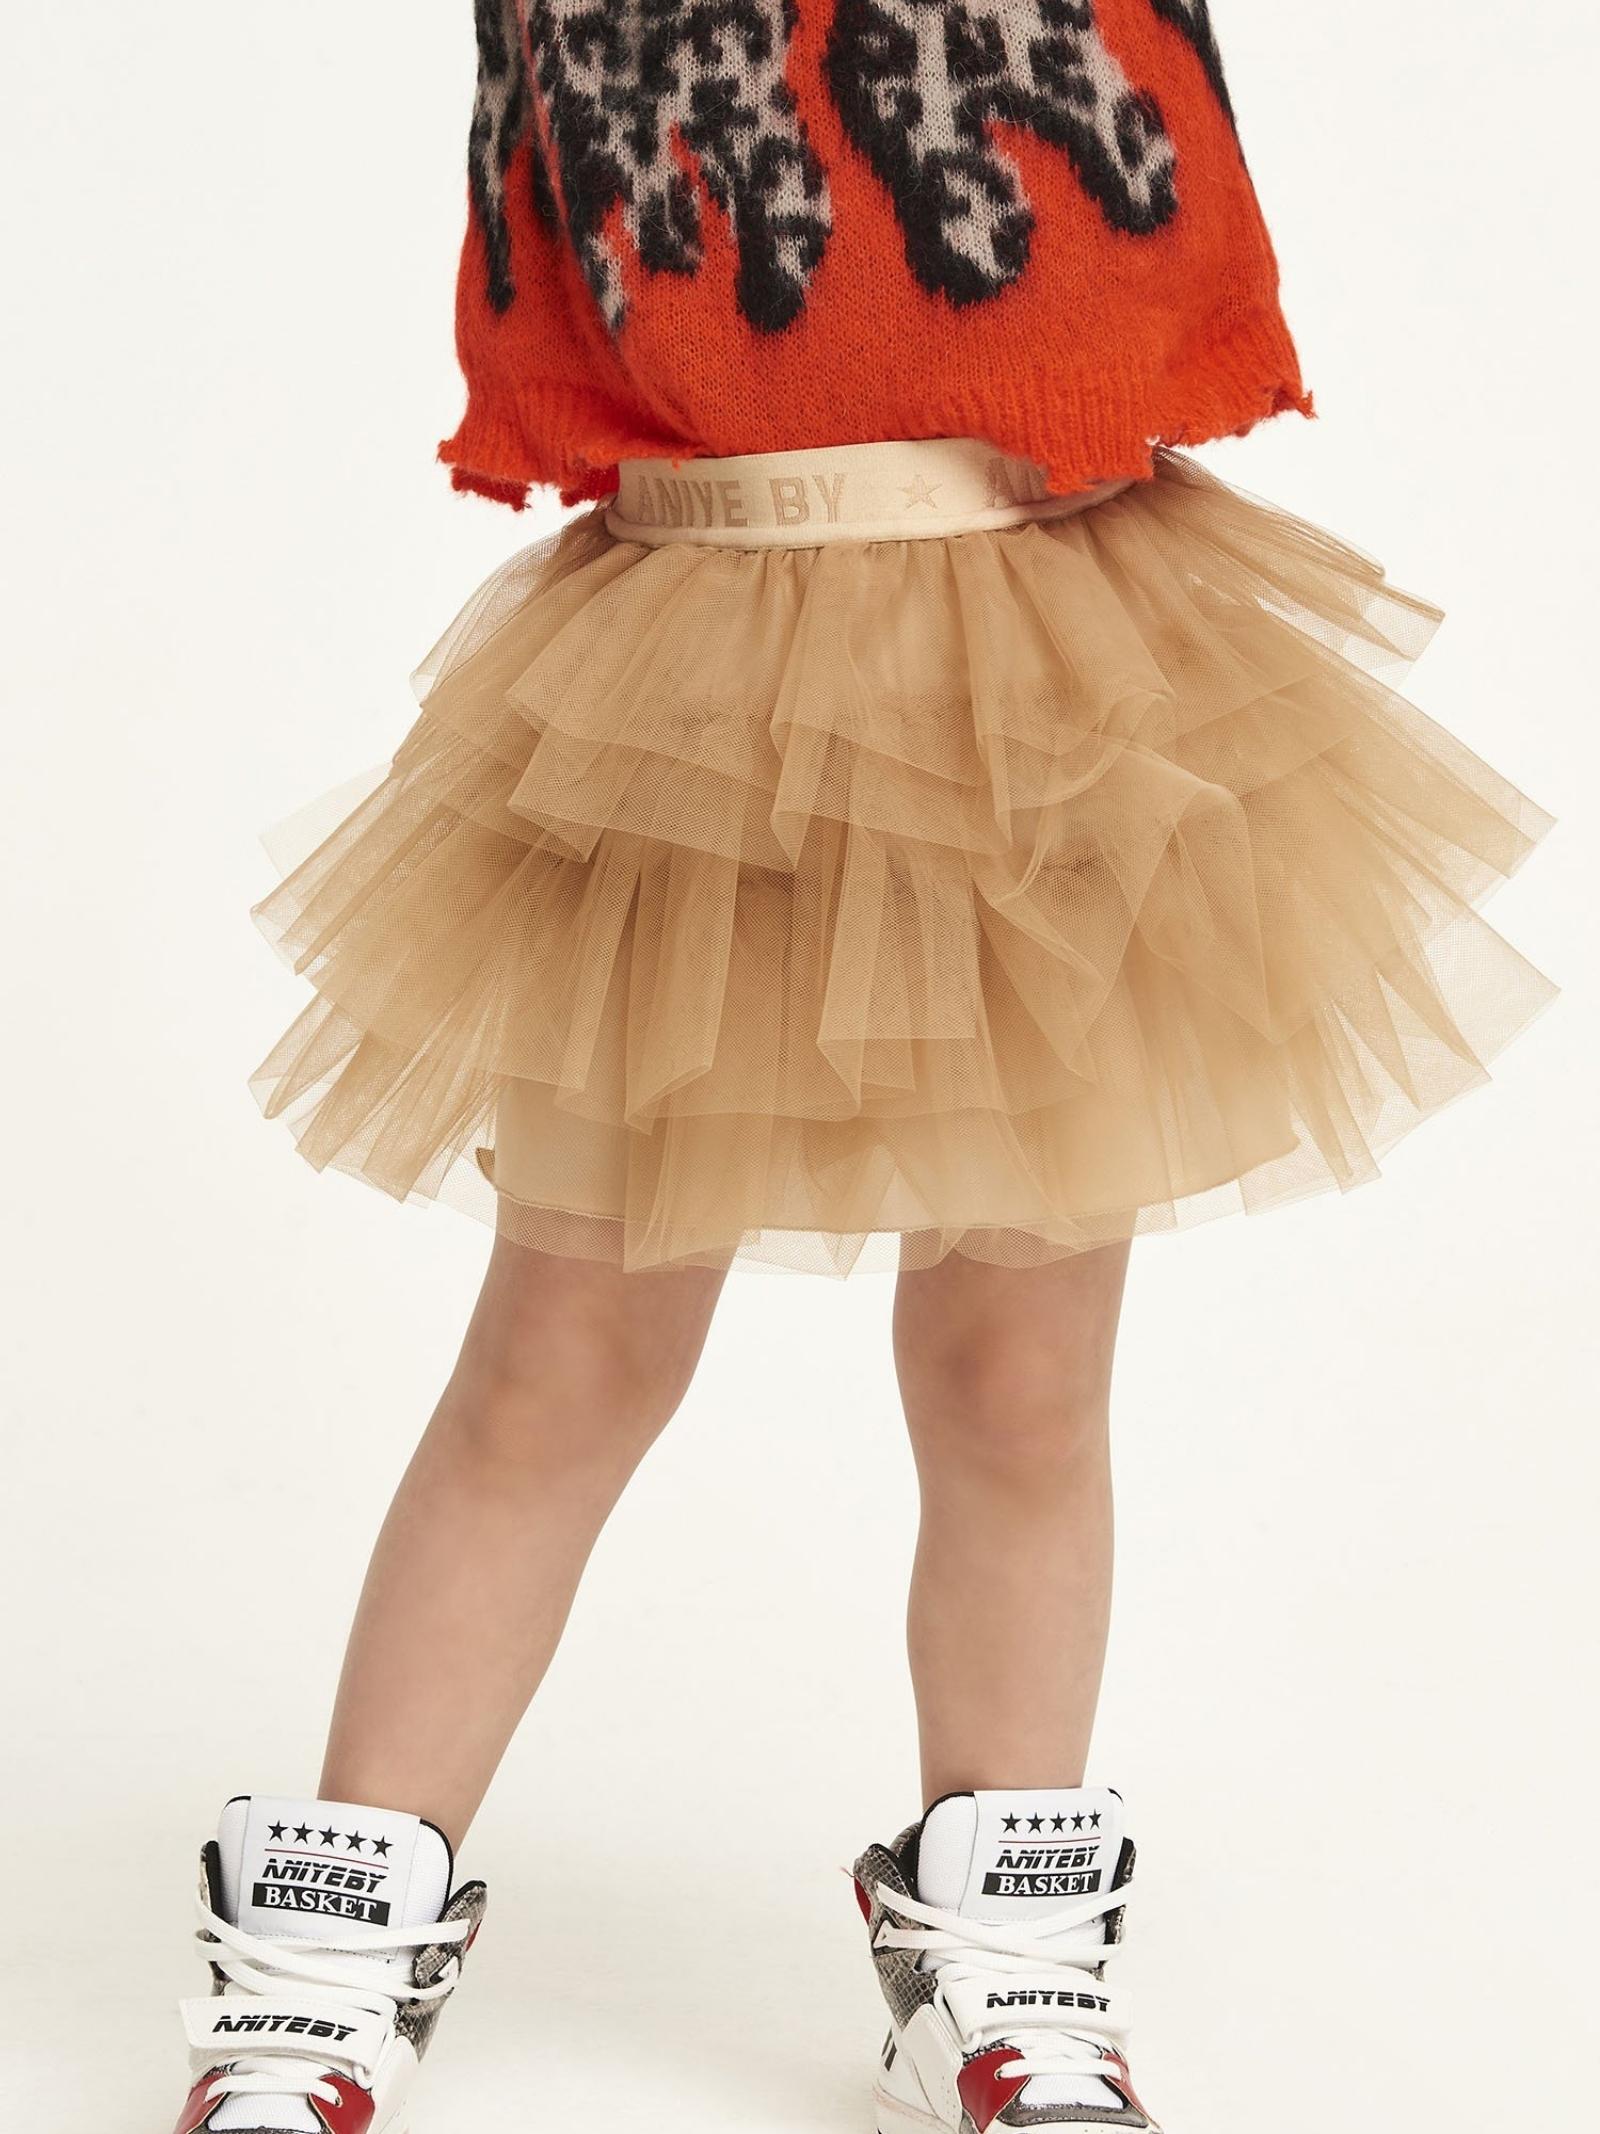 Tulle Skirt with Logo for Girls ANIYE BY GIRL | Skirts | 11125200459